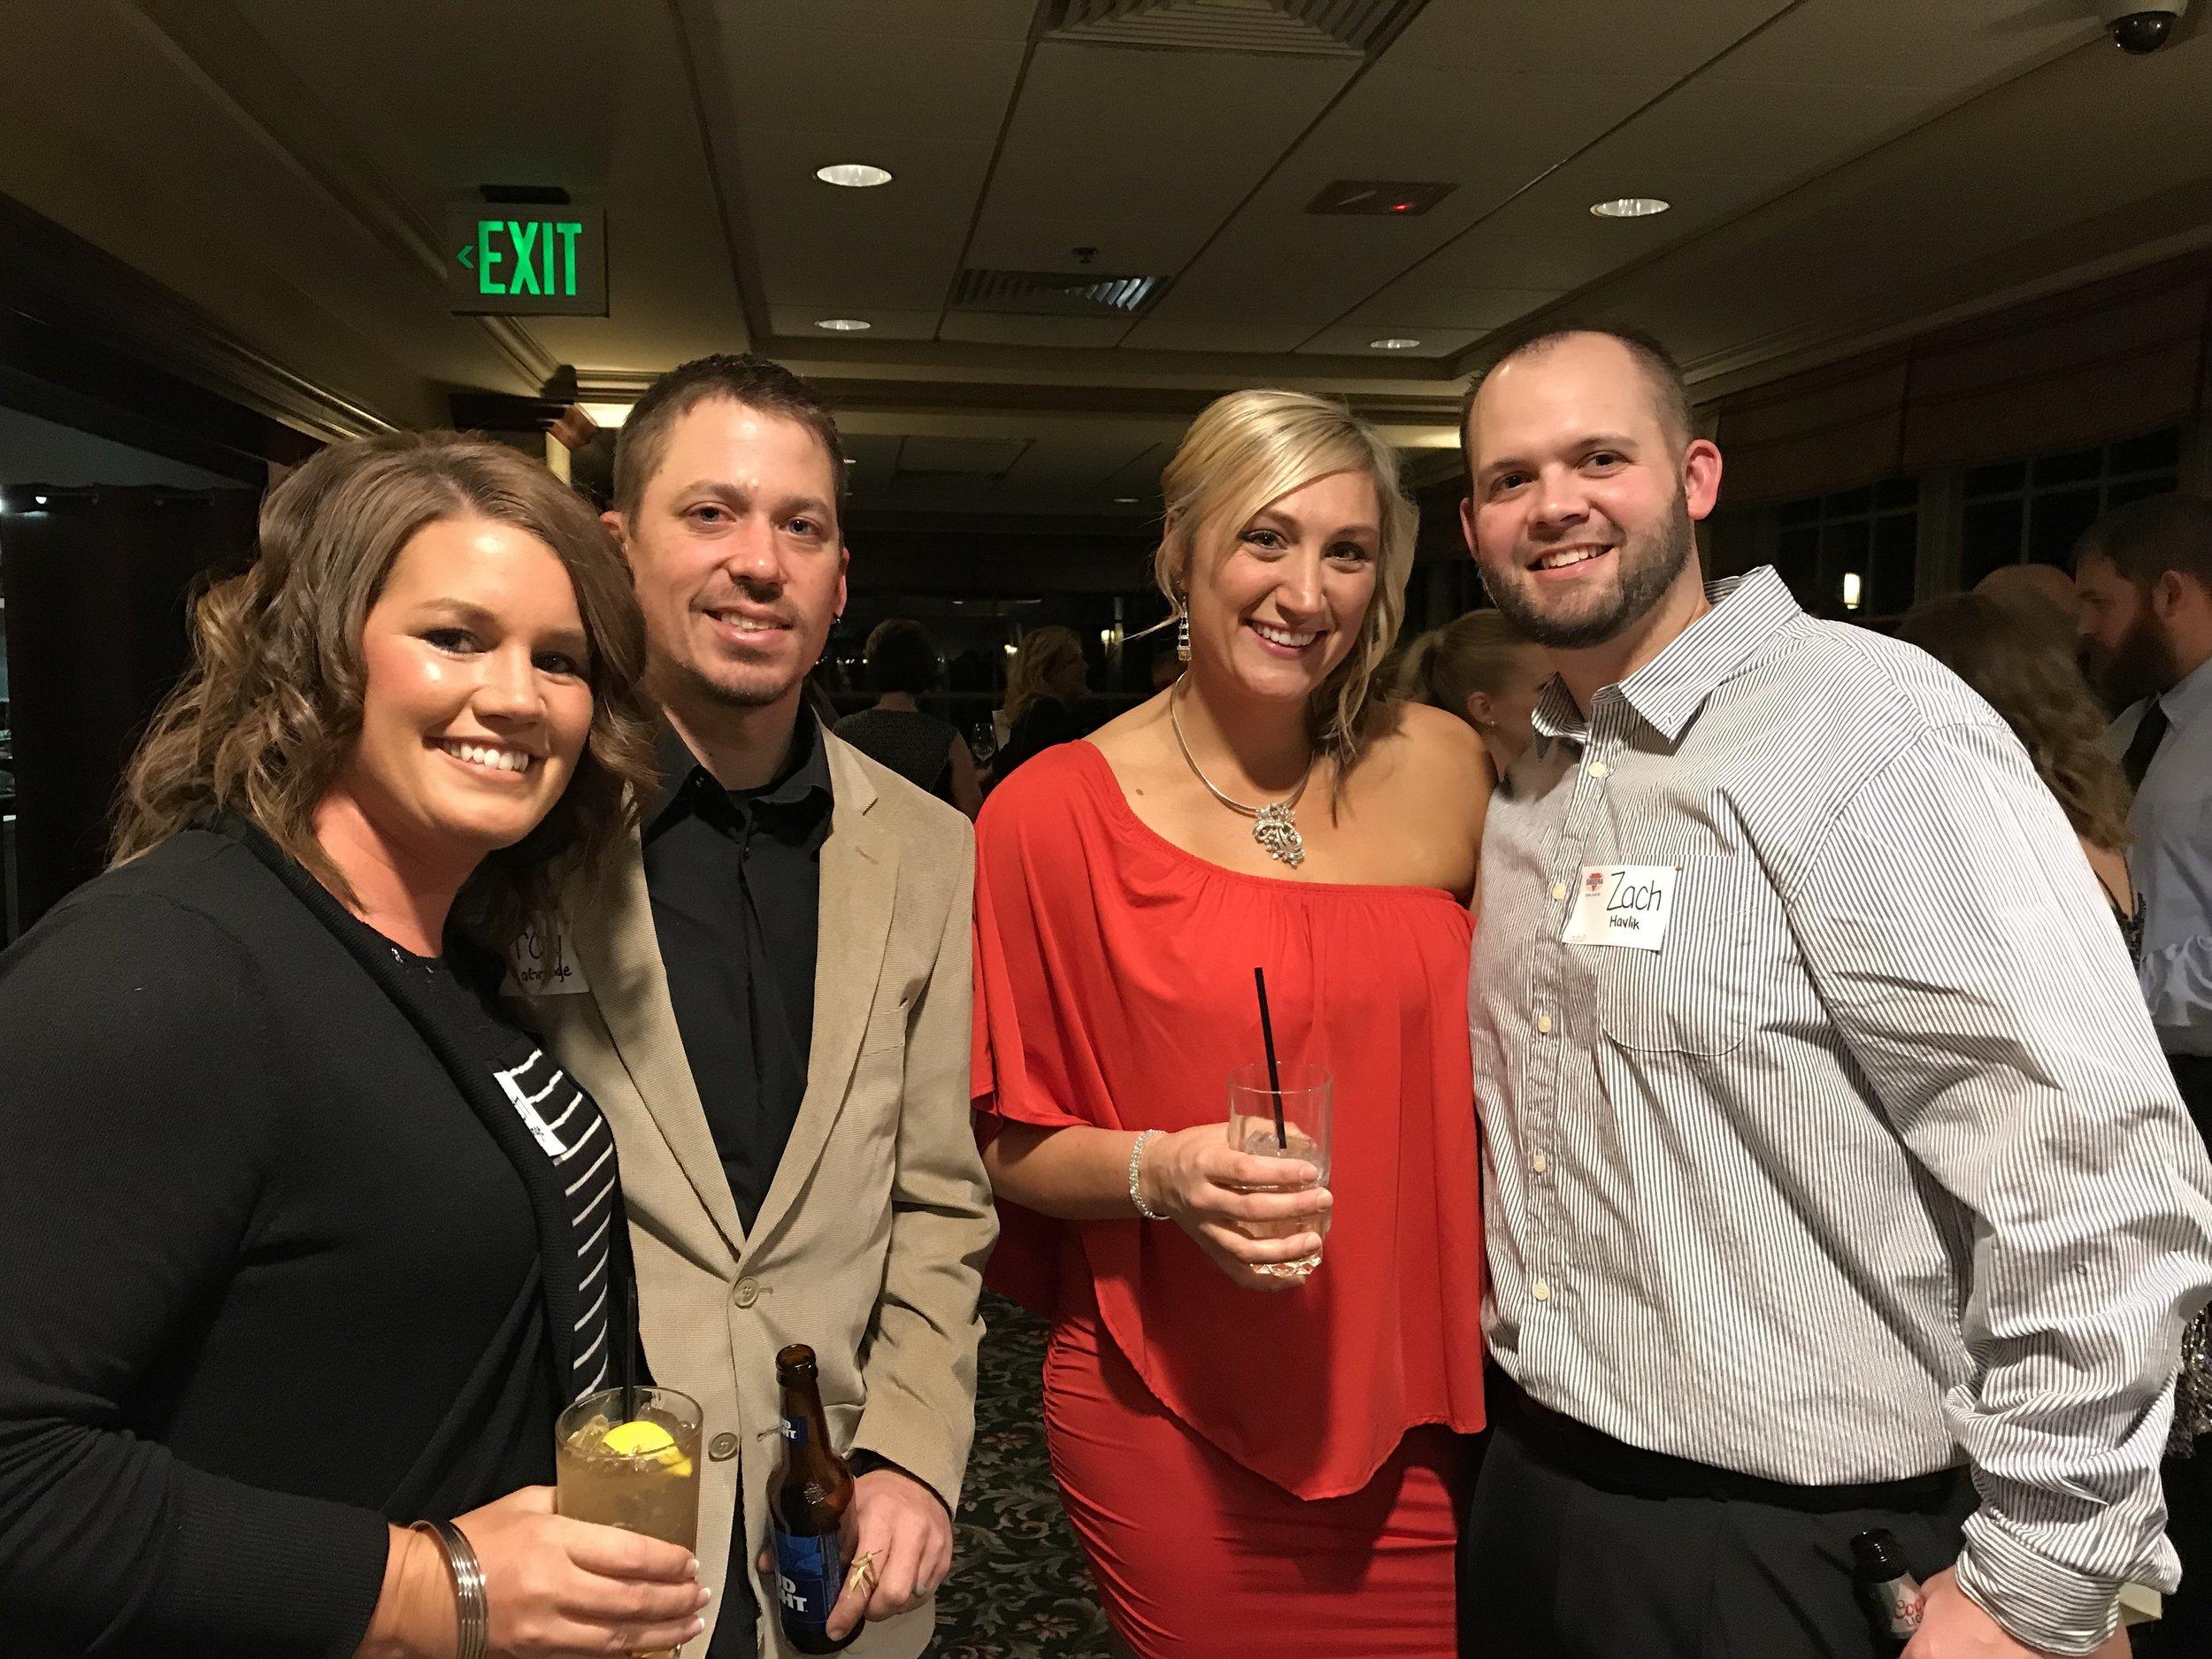 Karen & Troy LaGrange, and Theresa & Zach Havlik.